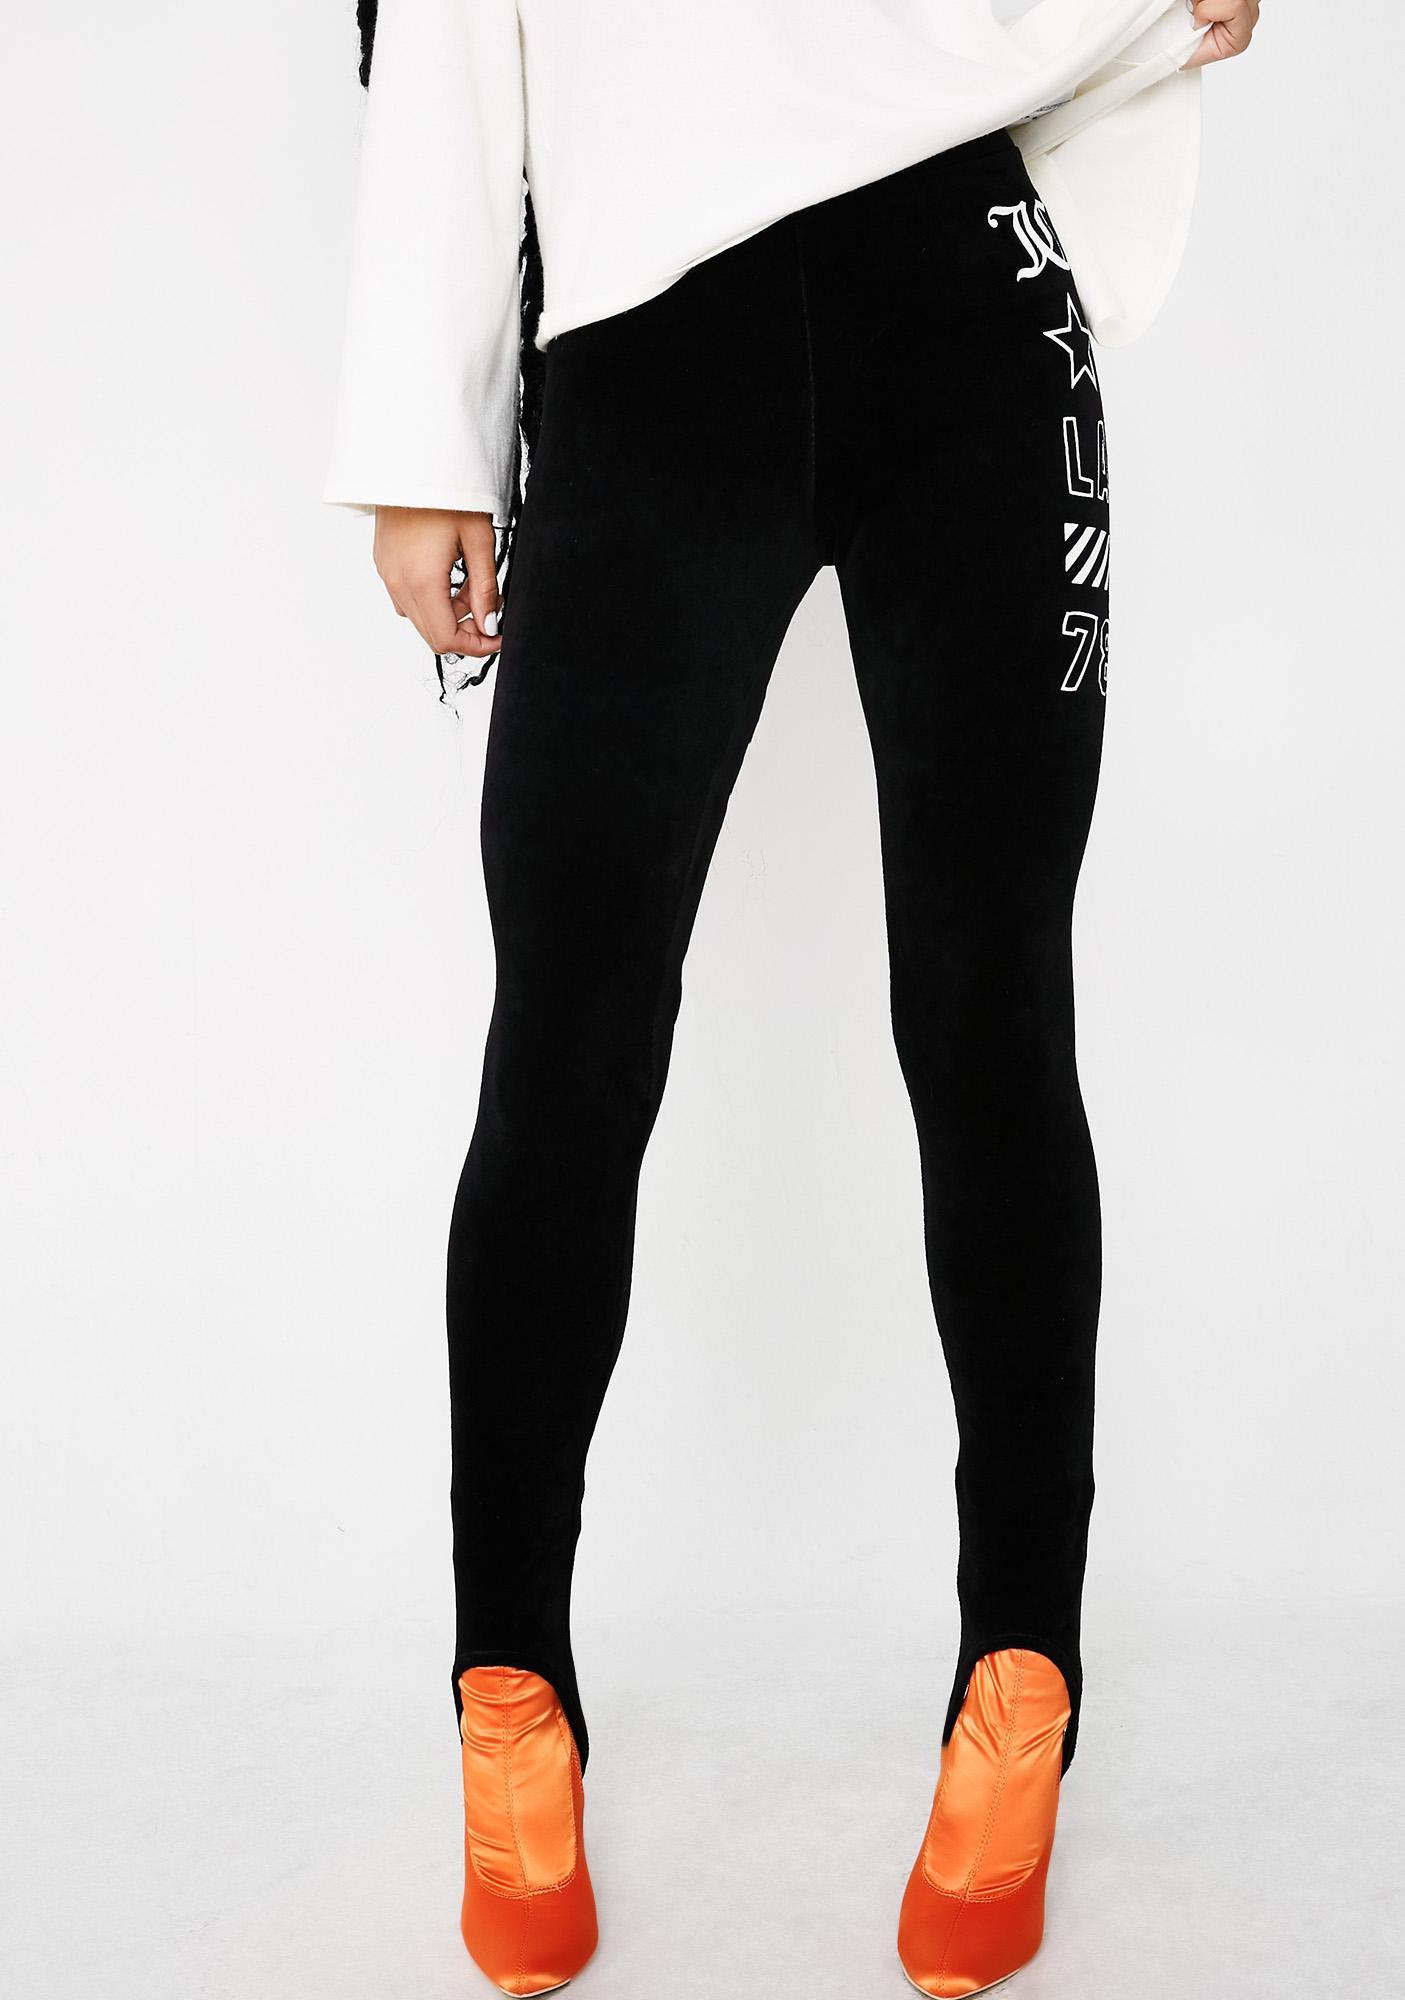 JUICY COUTURE Stretch Velour JCLA Stirrup Leggings